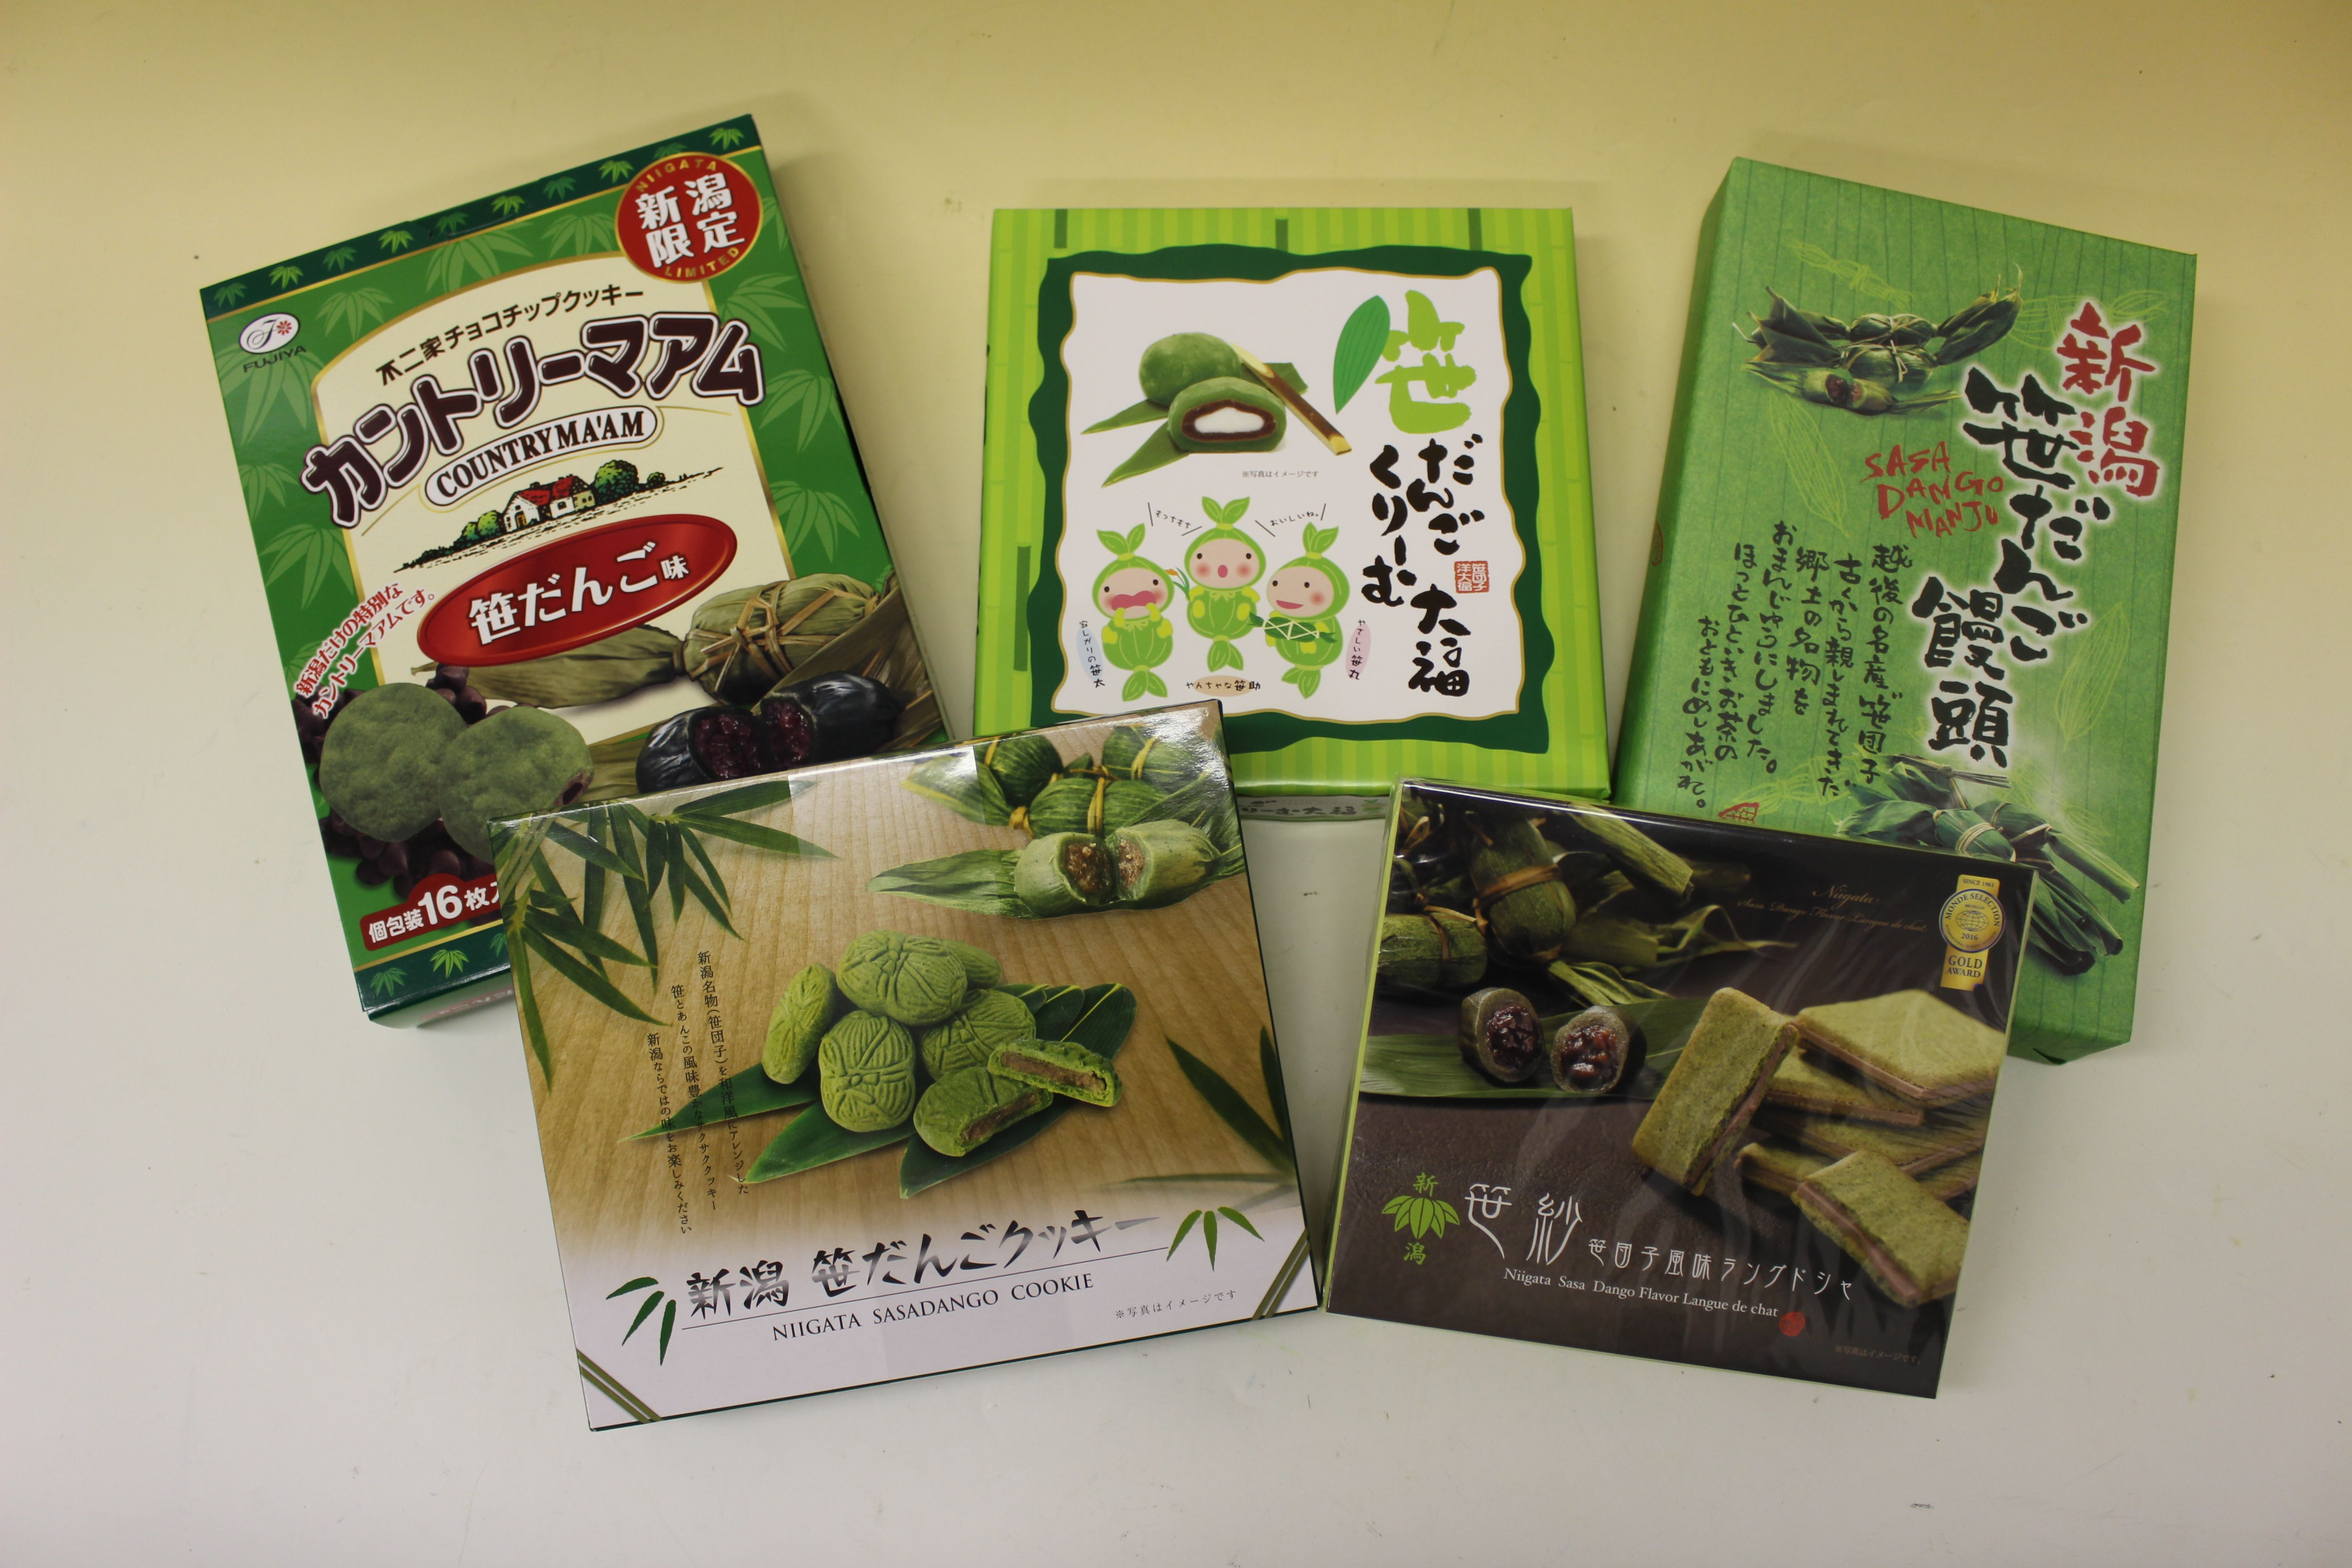 Yamagata And Niigata - 5 Local Dishes And Snacks You Must